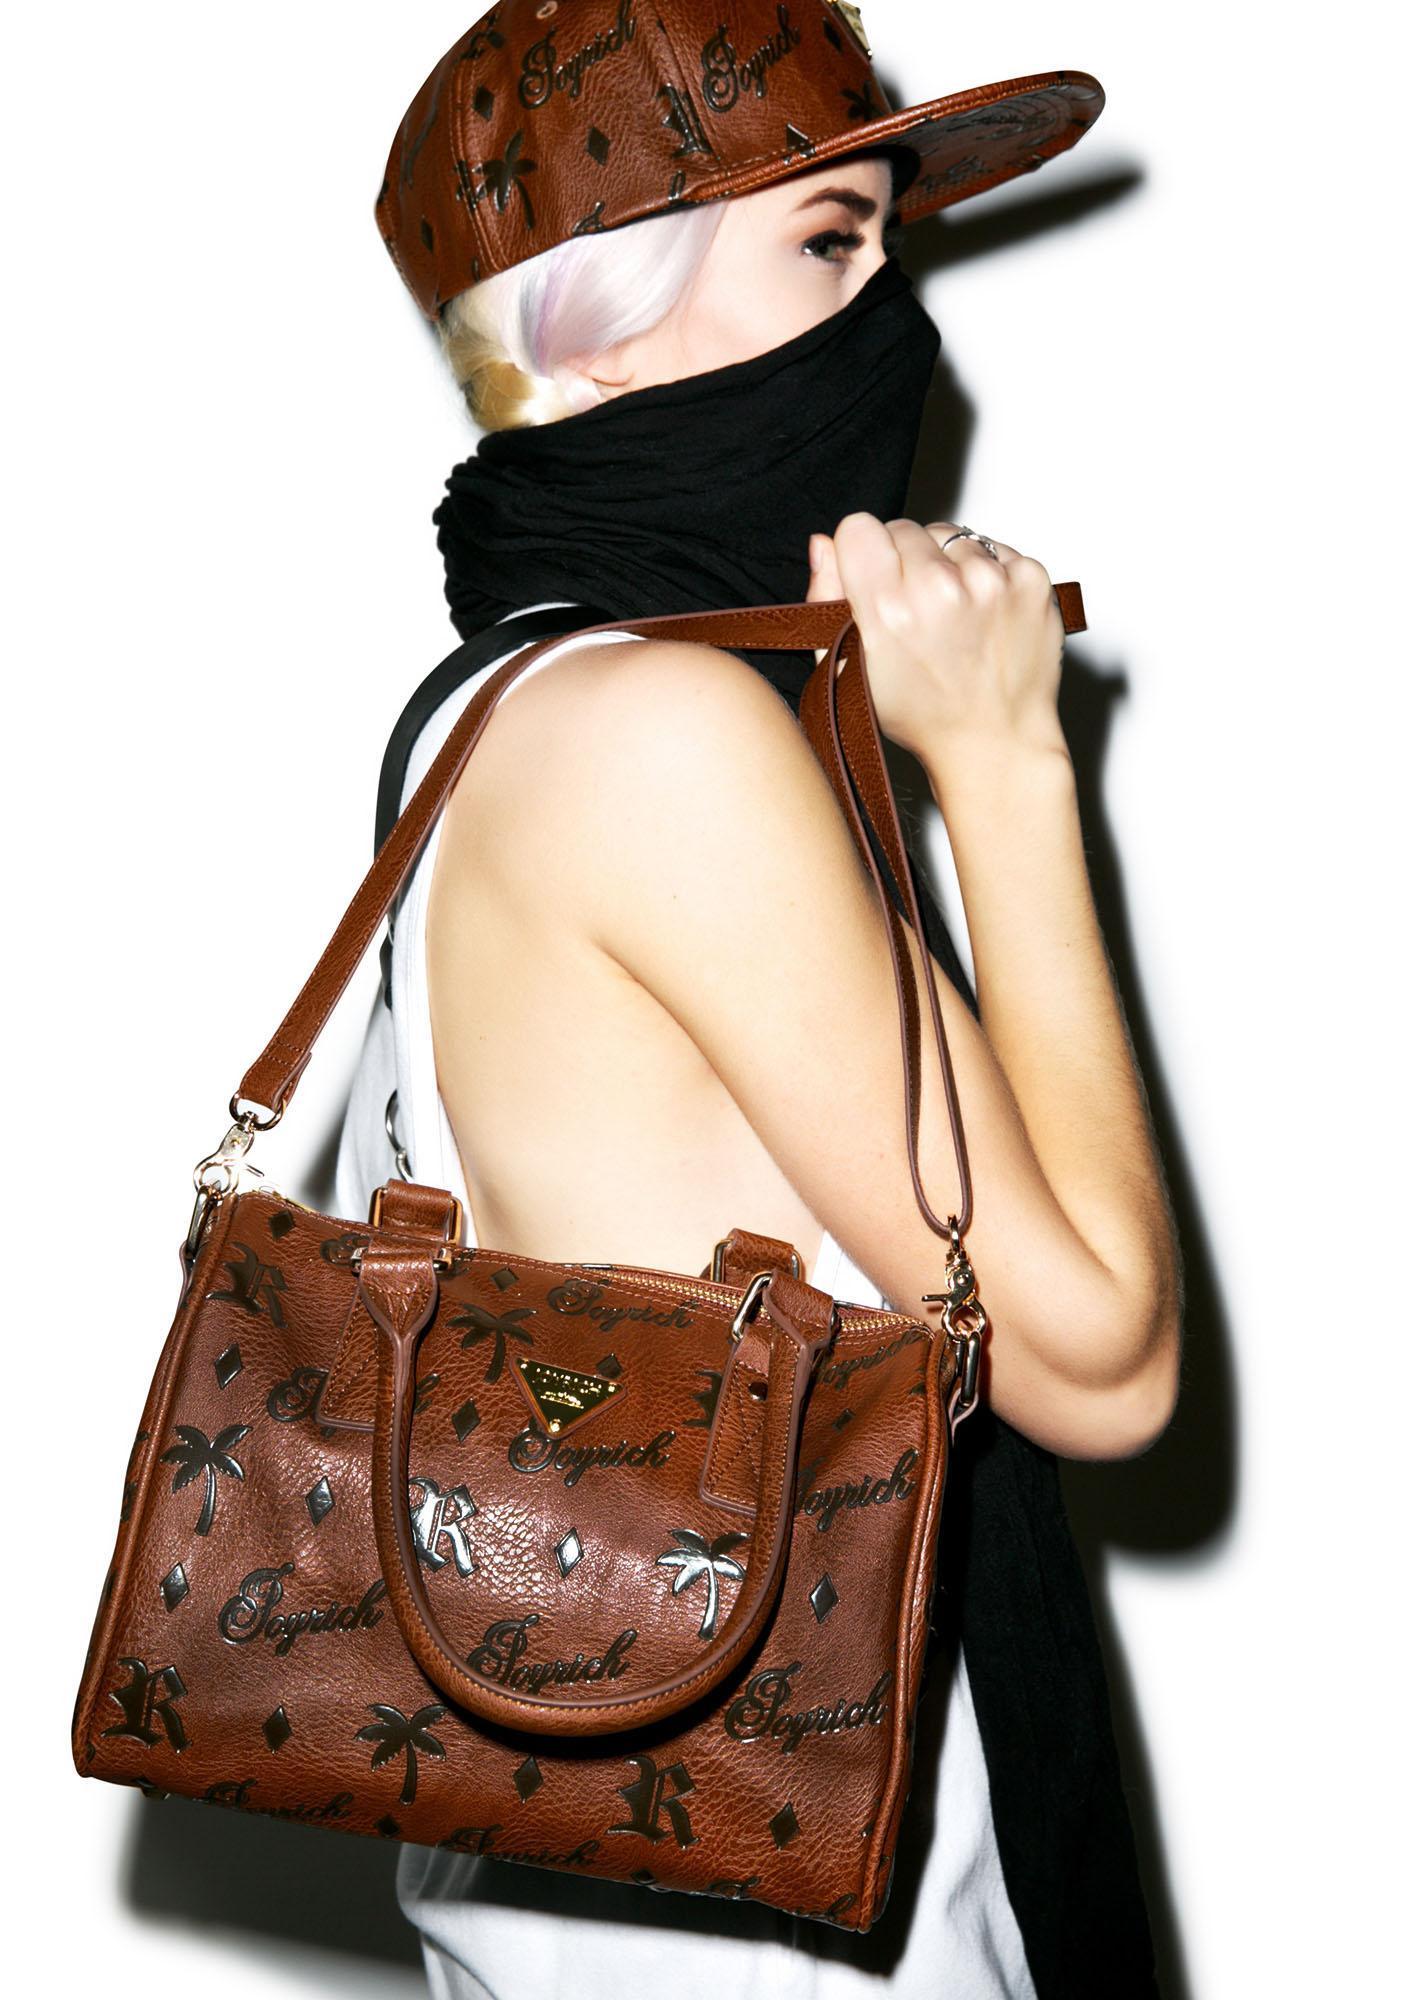 Joyrich Royal Rich Boston Shoulder Bag